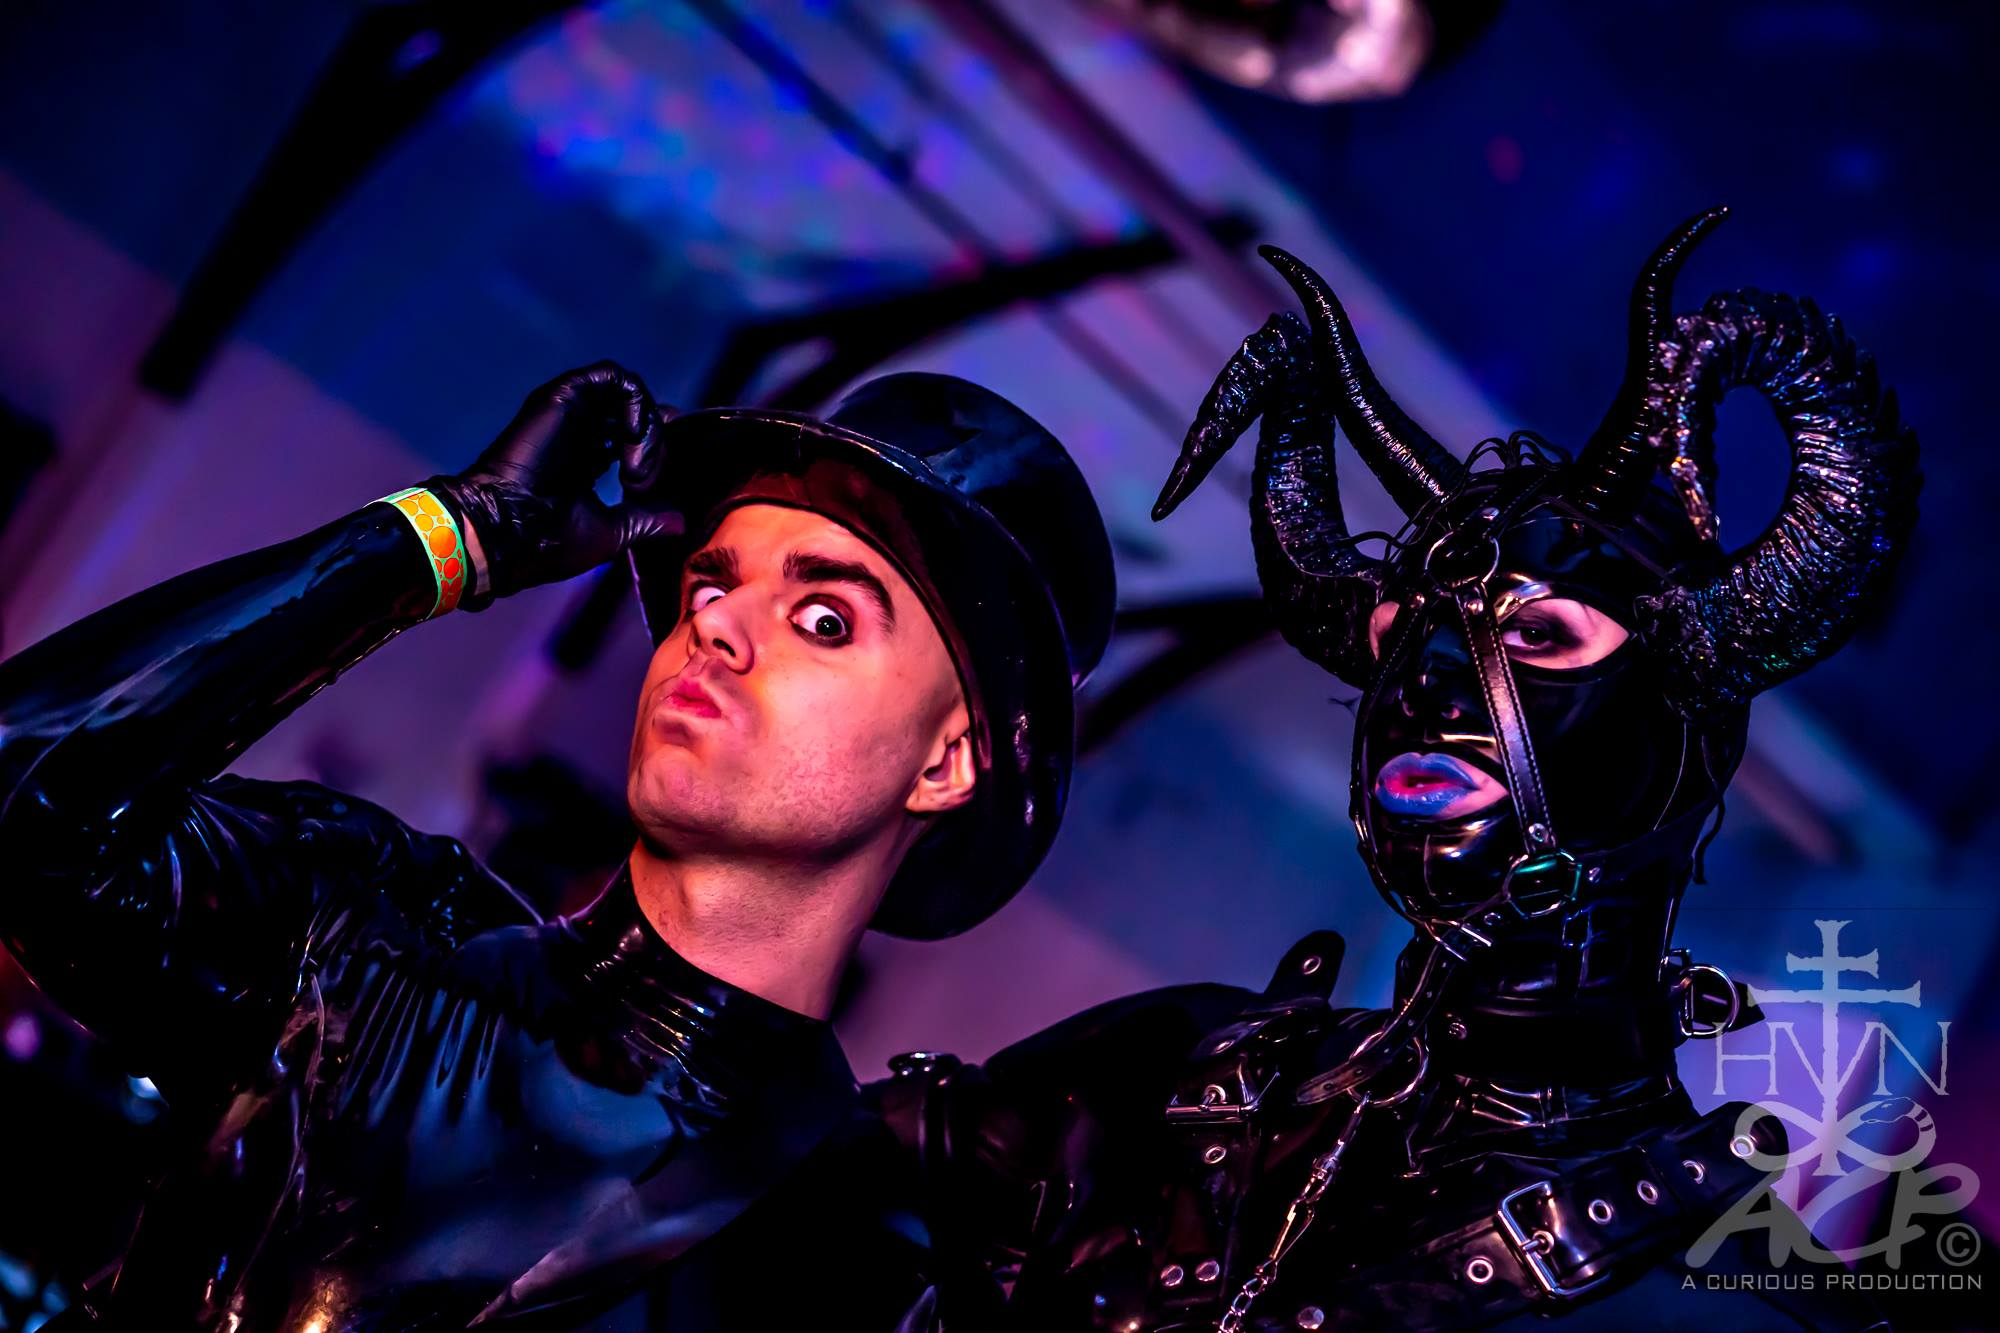 TheHavenClub-Goth-Industrial-Dance-Alternative-Northampton-MA-Exotic Erotic 2018 (72).jpg